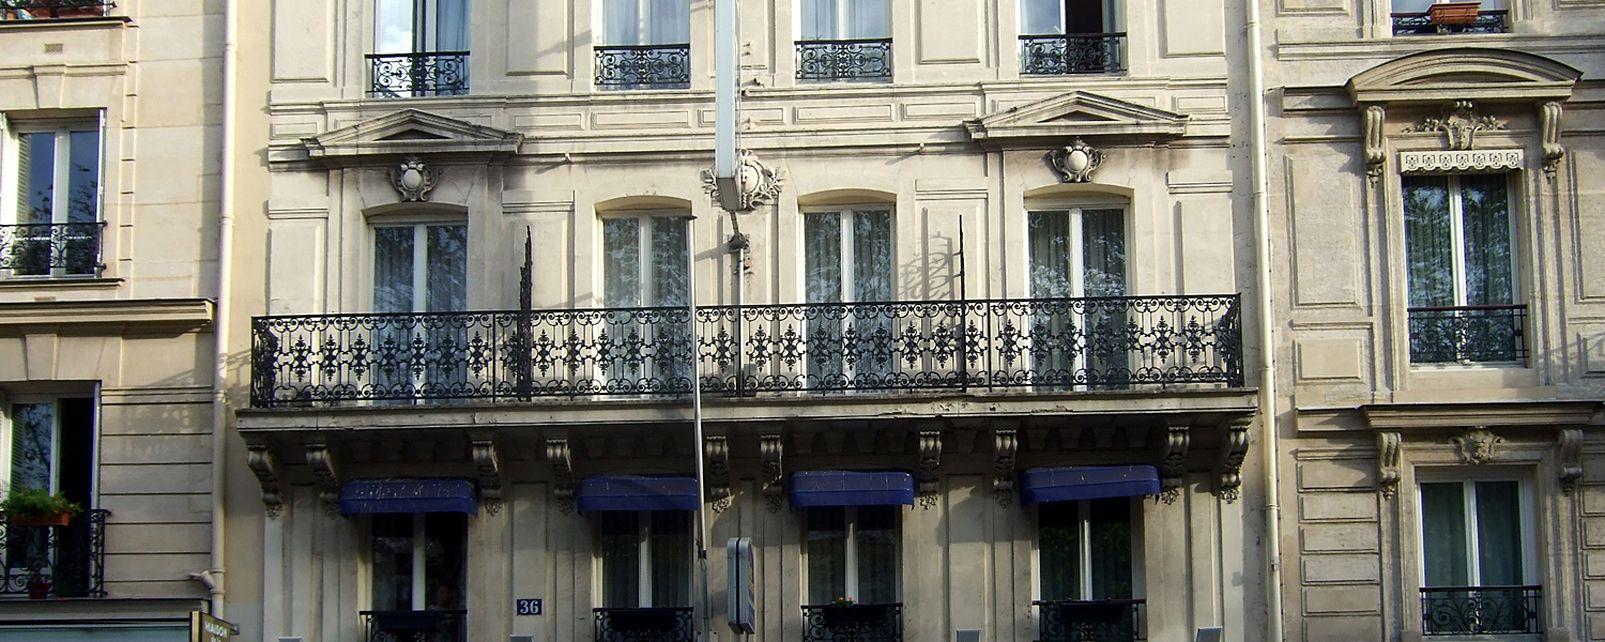 H tel best western marais bastille paris france for Bastille hotel